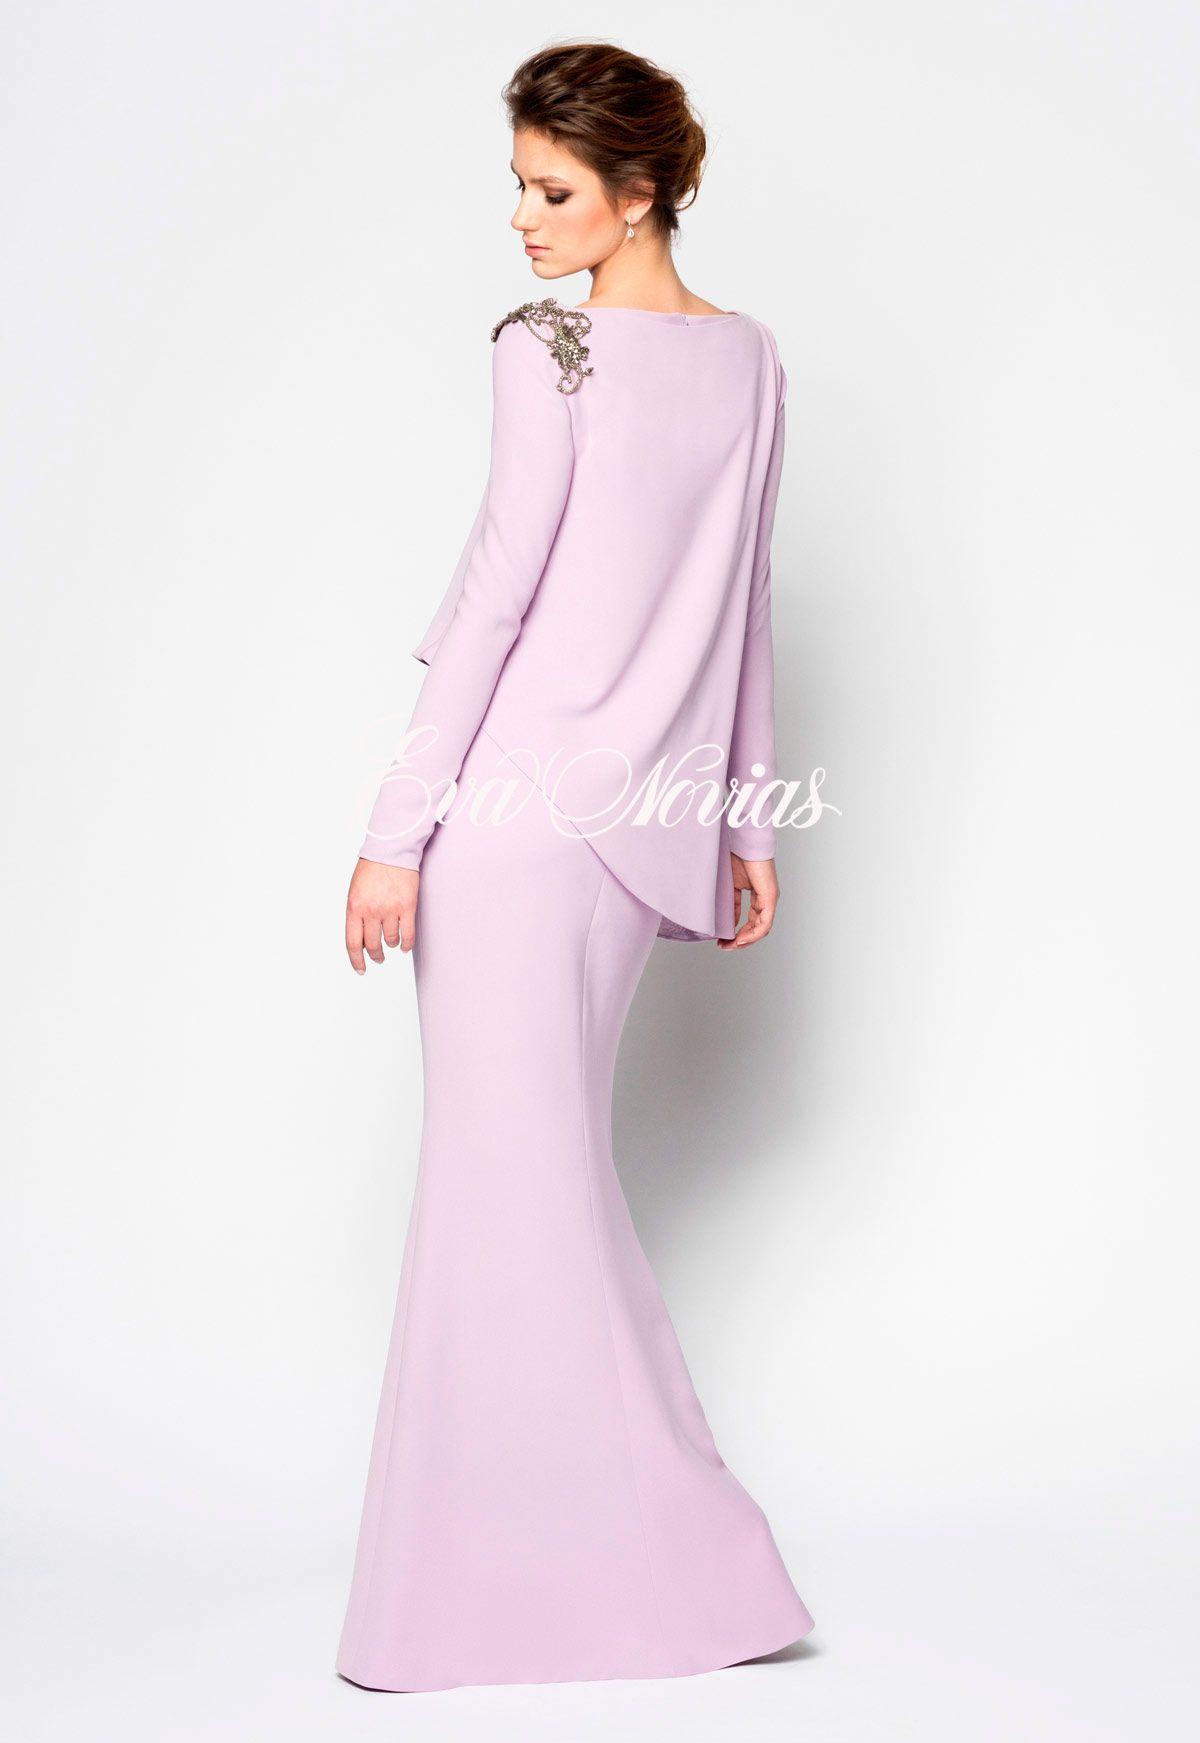 Vestido de fiesta Modelo Alegria | Vestidos | Pinterest | La firma ...